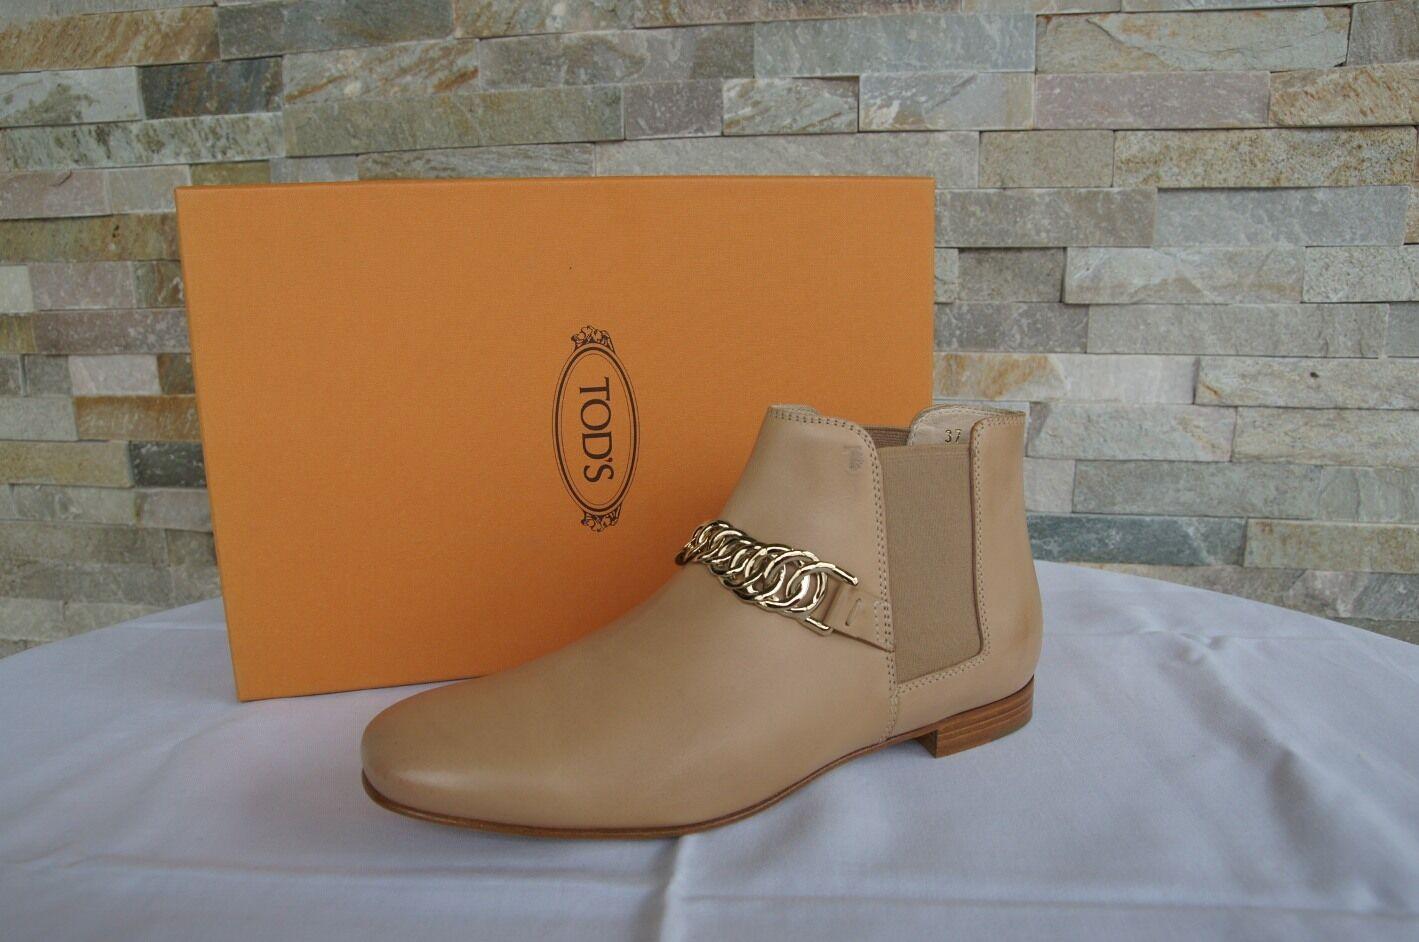 TODS Stivali TOD'S TAGLIA 37 Stivaletti Stivali TODS Chelsea Scarpe Shoes Nude Carne Nuovo UVP b48129